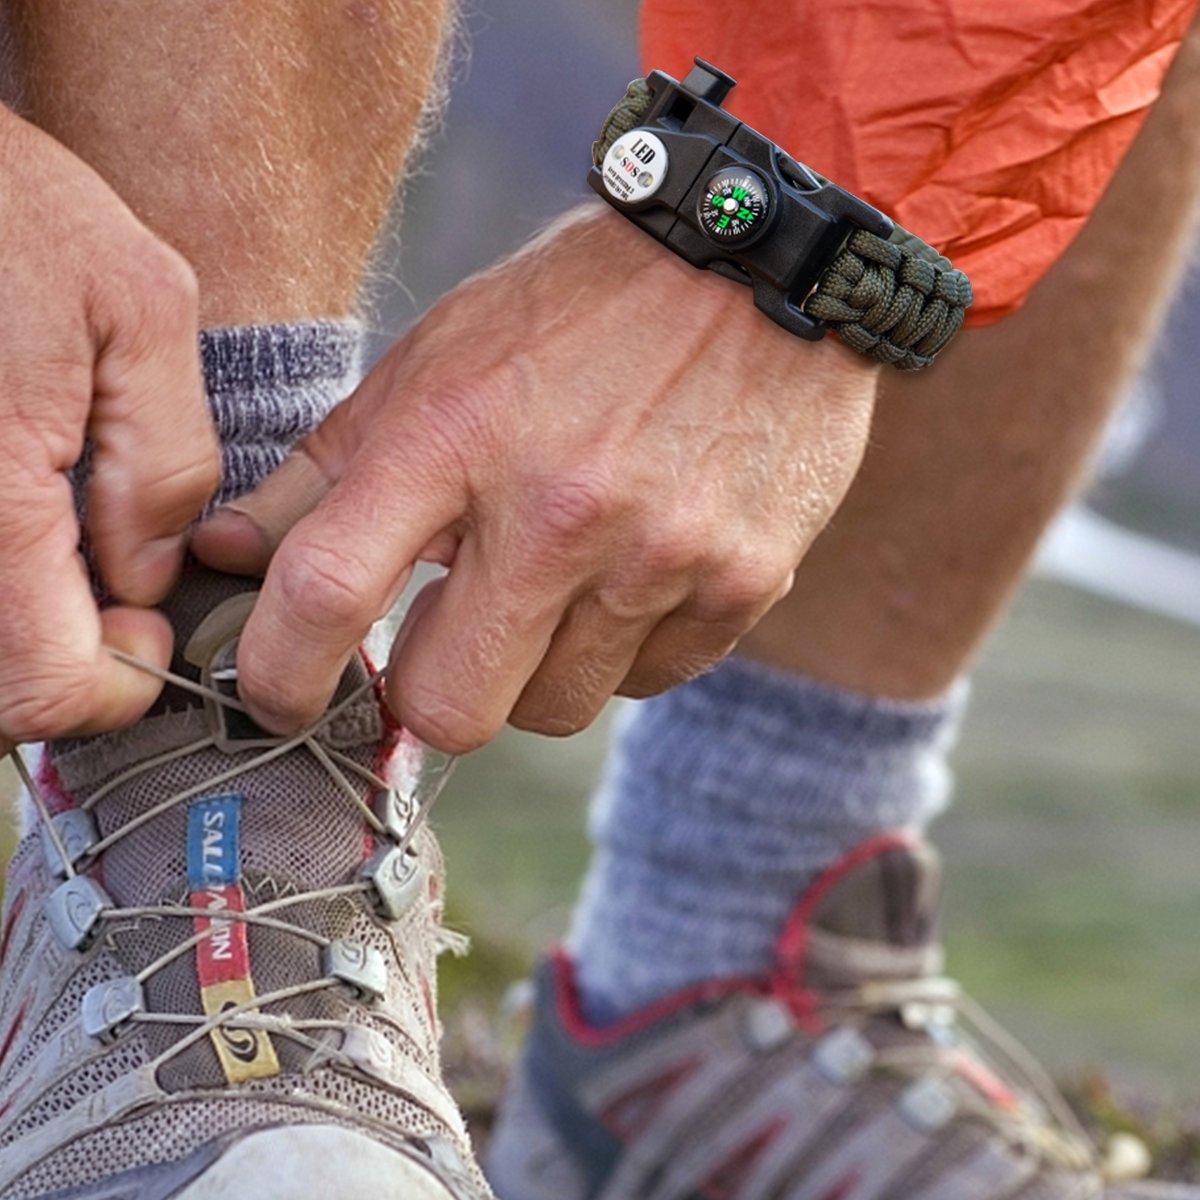 Notfall-Trillerpfeife bermunavy Fallschirmseil-Armband Kompass Survival-Armb/änder f/ür Notfallsituationen Feueranz/ünder, gr/ün und Mini-Multitool 2er Pack Survival SOS-LED-Licht